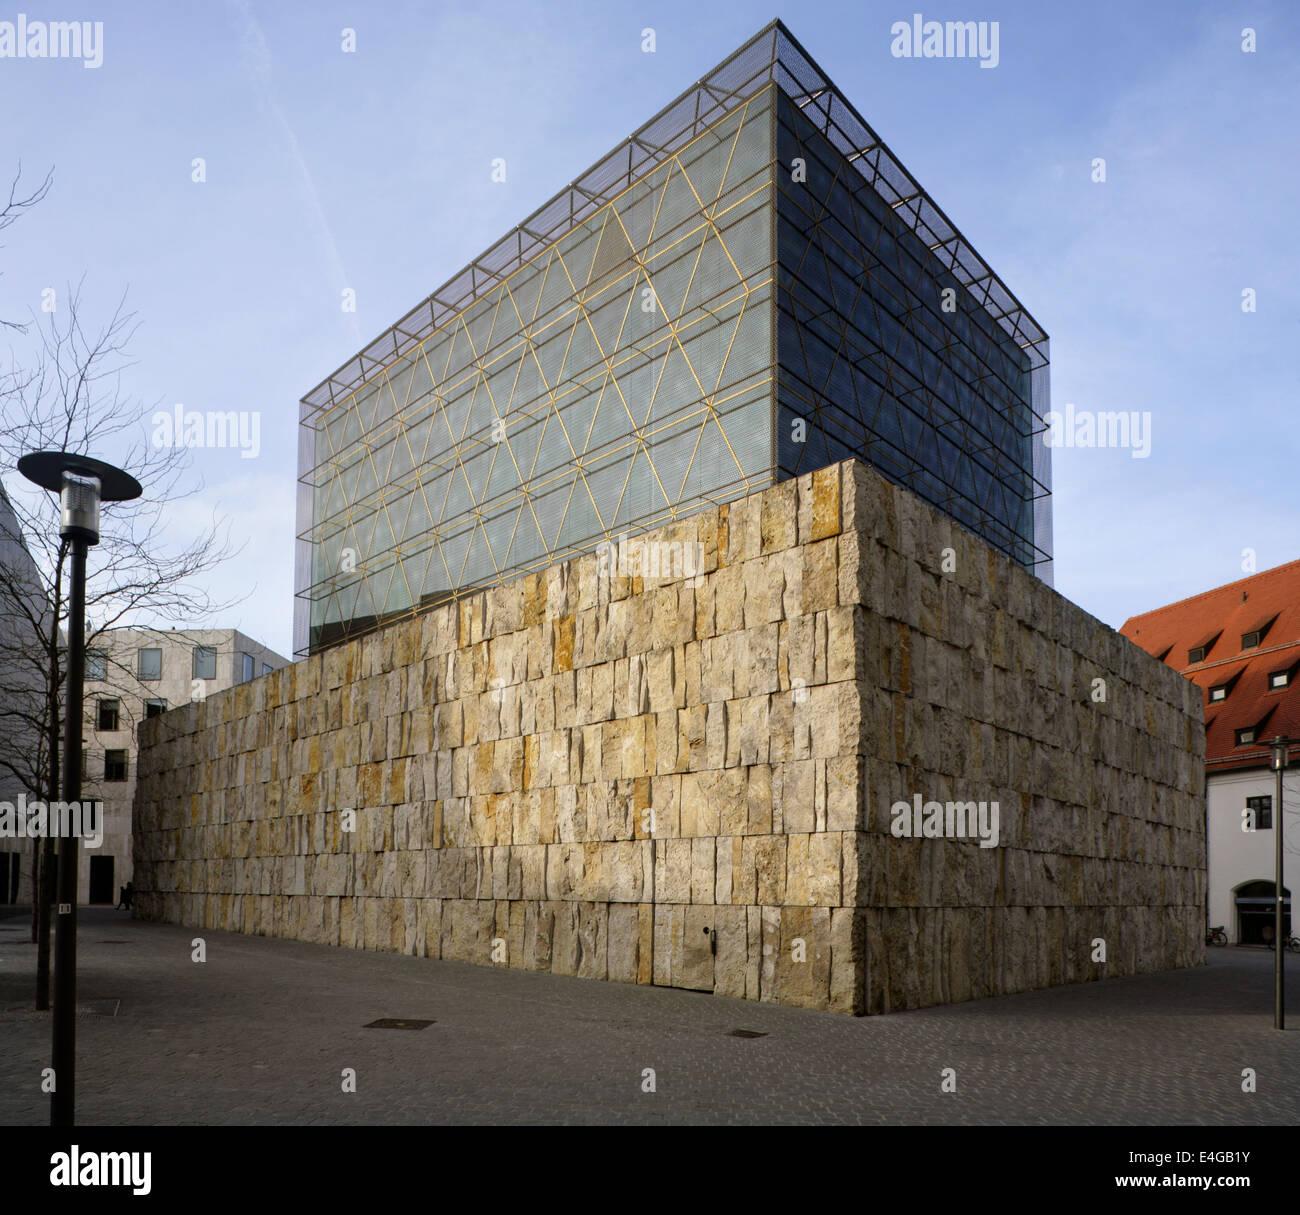 The Ohel-Jakob (Jacob's Tent) Synagogue, Sankt Jakobs Platz, Munich, Germany. Designed by Rena Wandel-Hoefer & Wolfgang Stock Photo